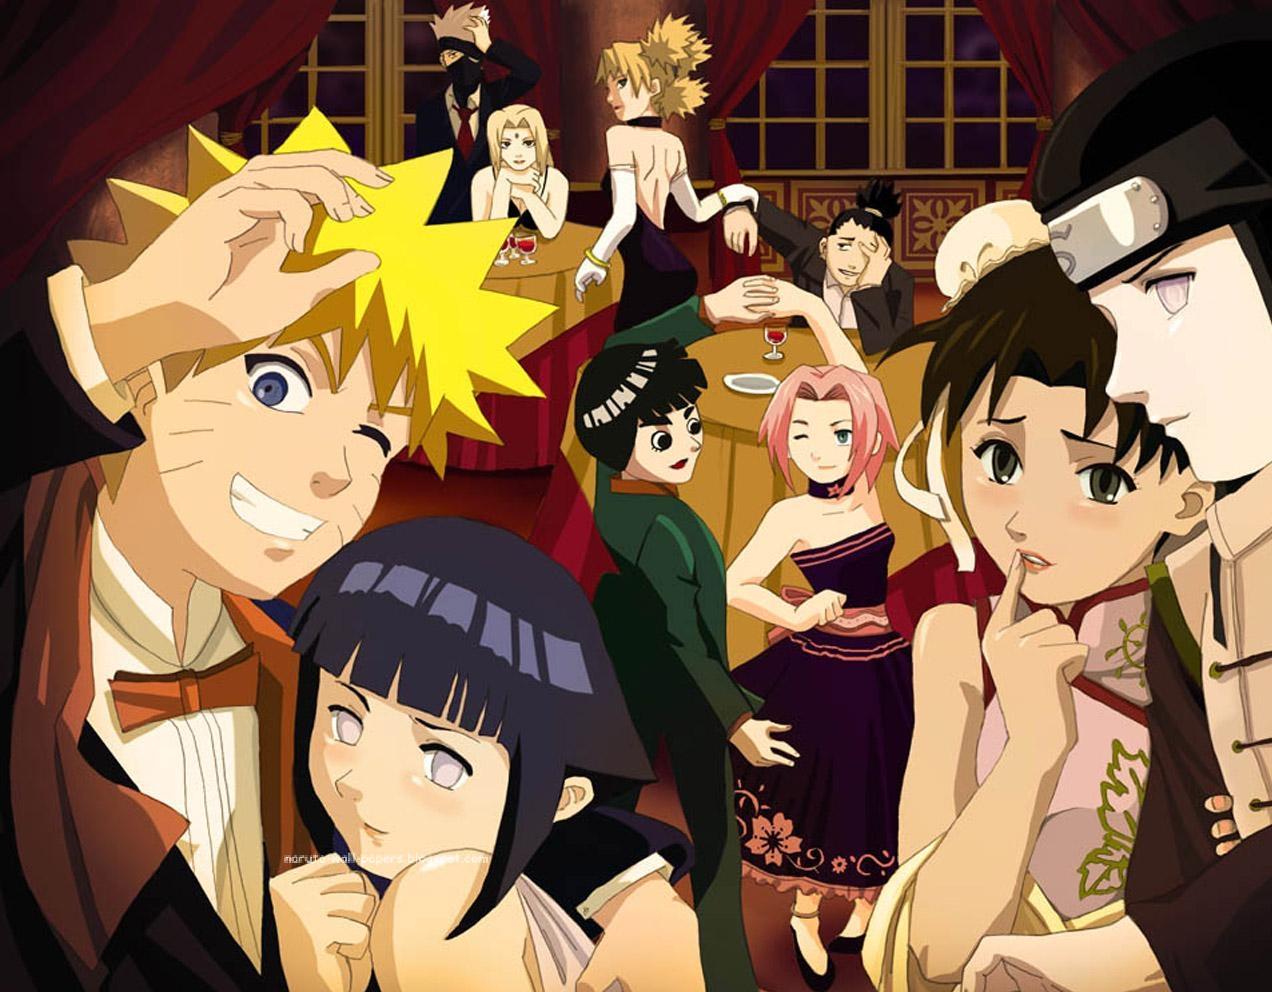 Naruto And Bleach Anime Wallpapers: Naruto Shippuden